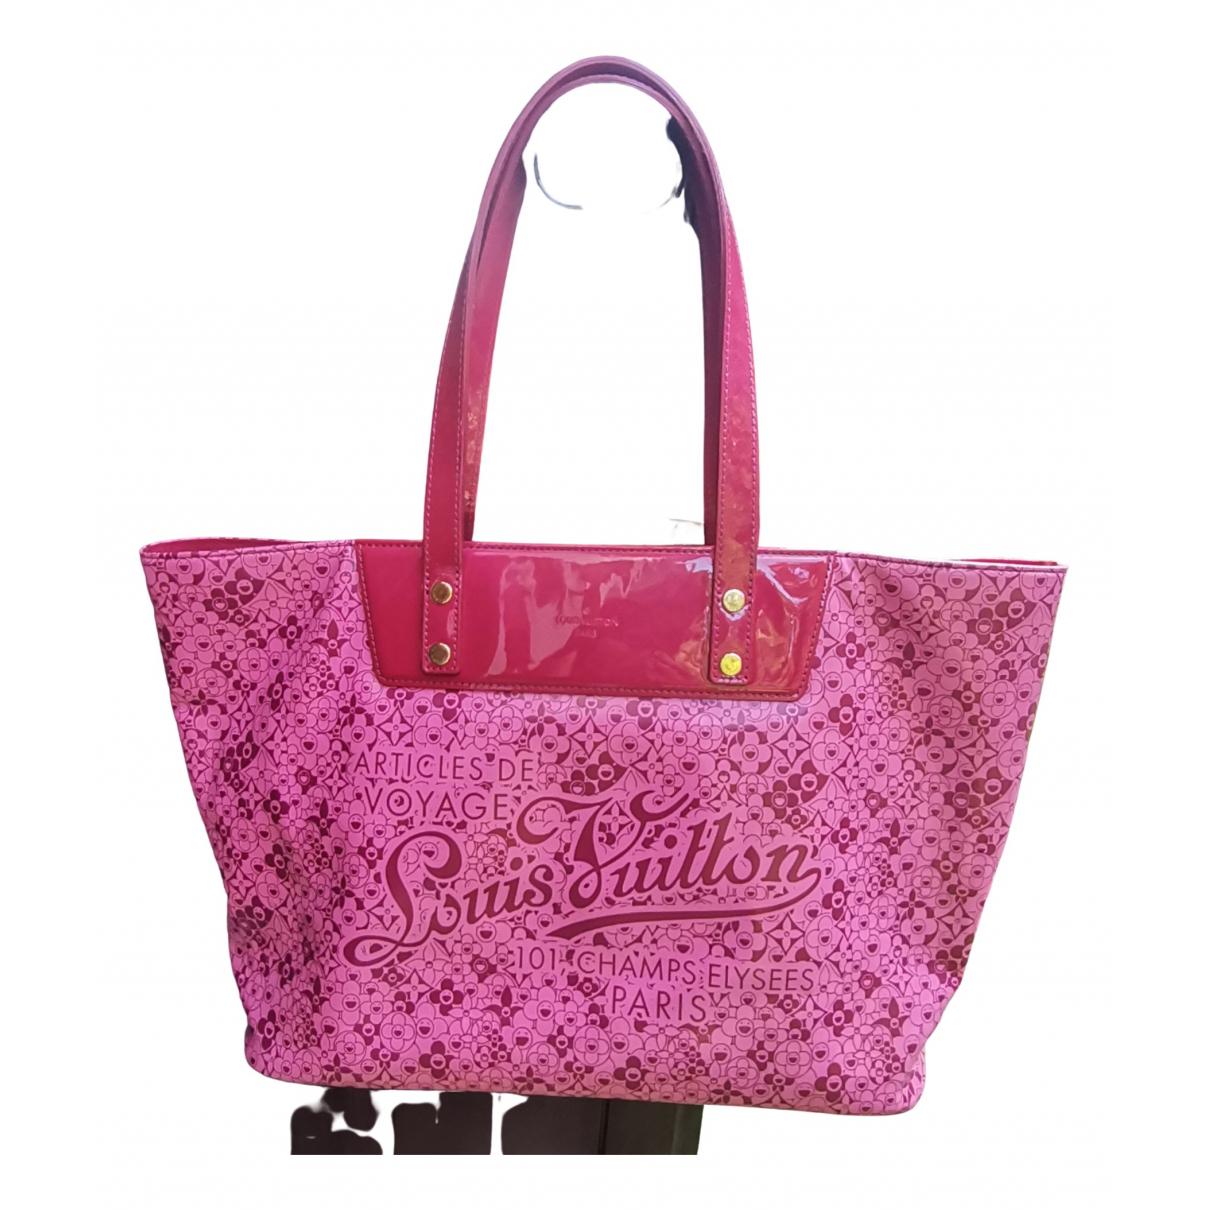 Louis Vuitton - Sac a main Cosmic blossom pour femme - rose